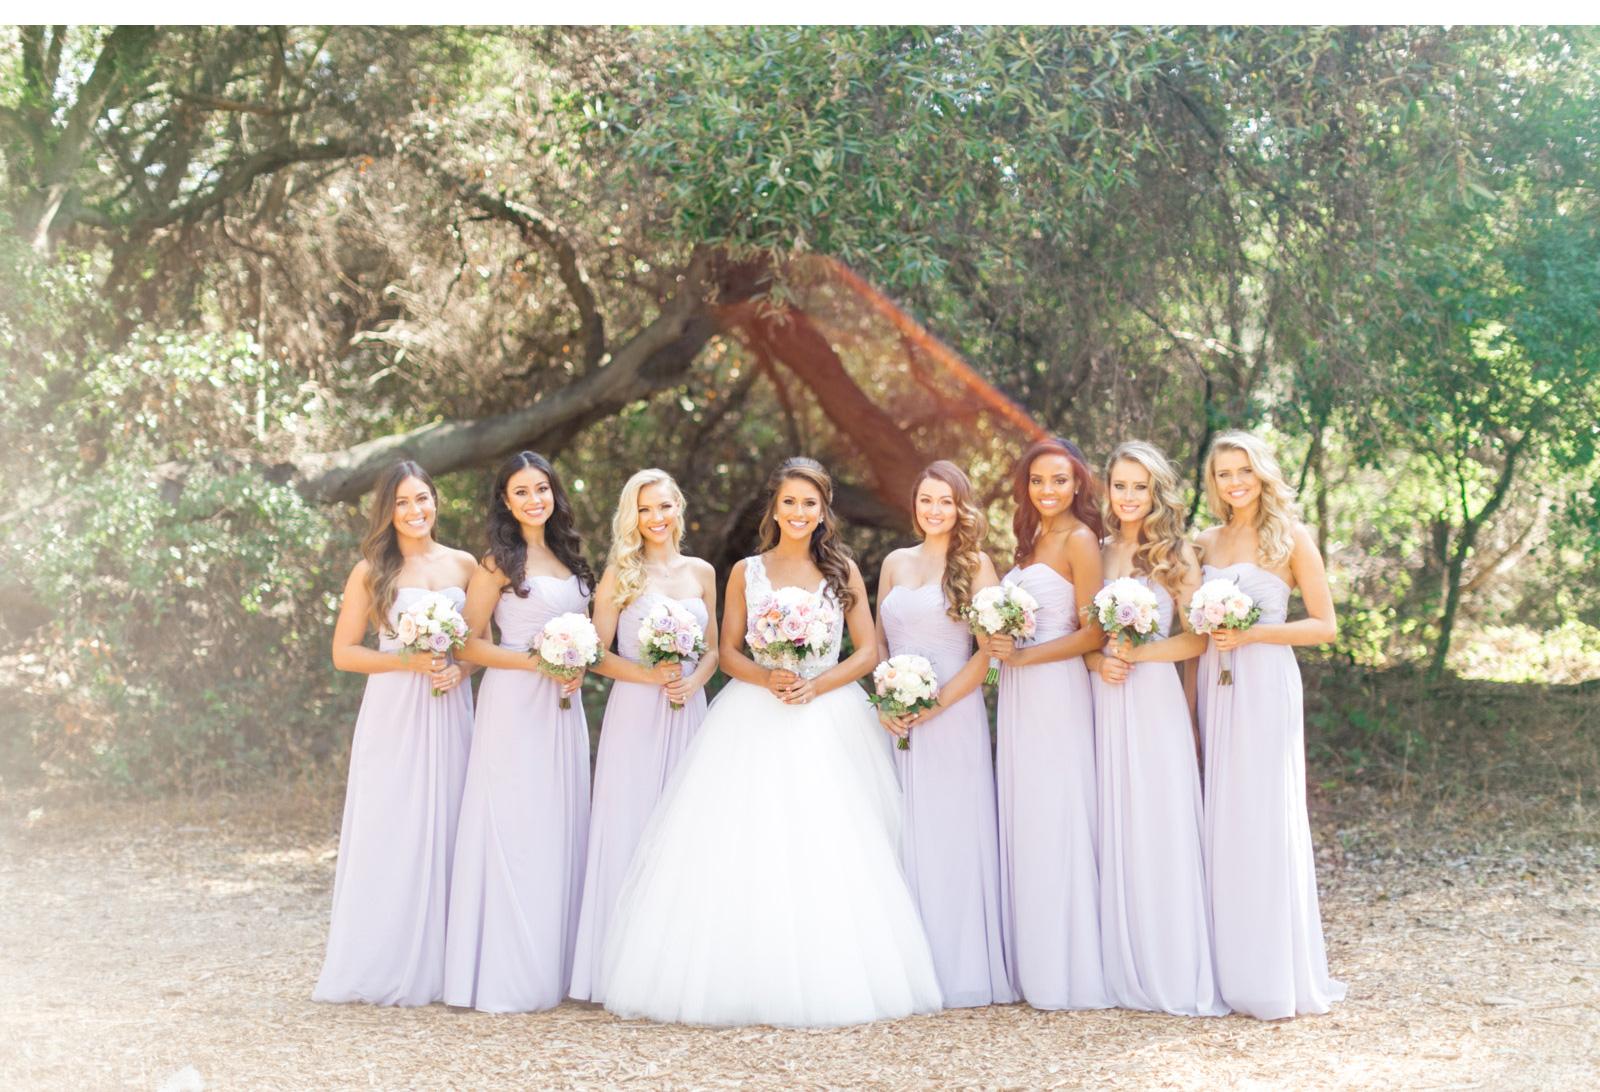 Miss-USA-Temecula-Wedding-Natalie-Schutt-Photography_03.jpg